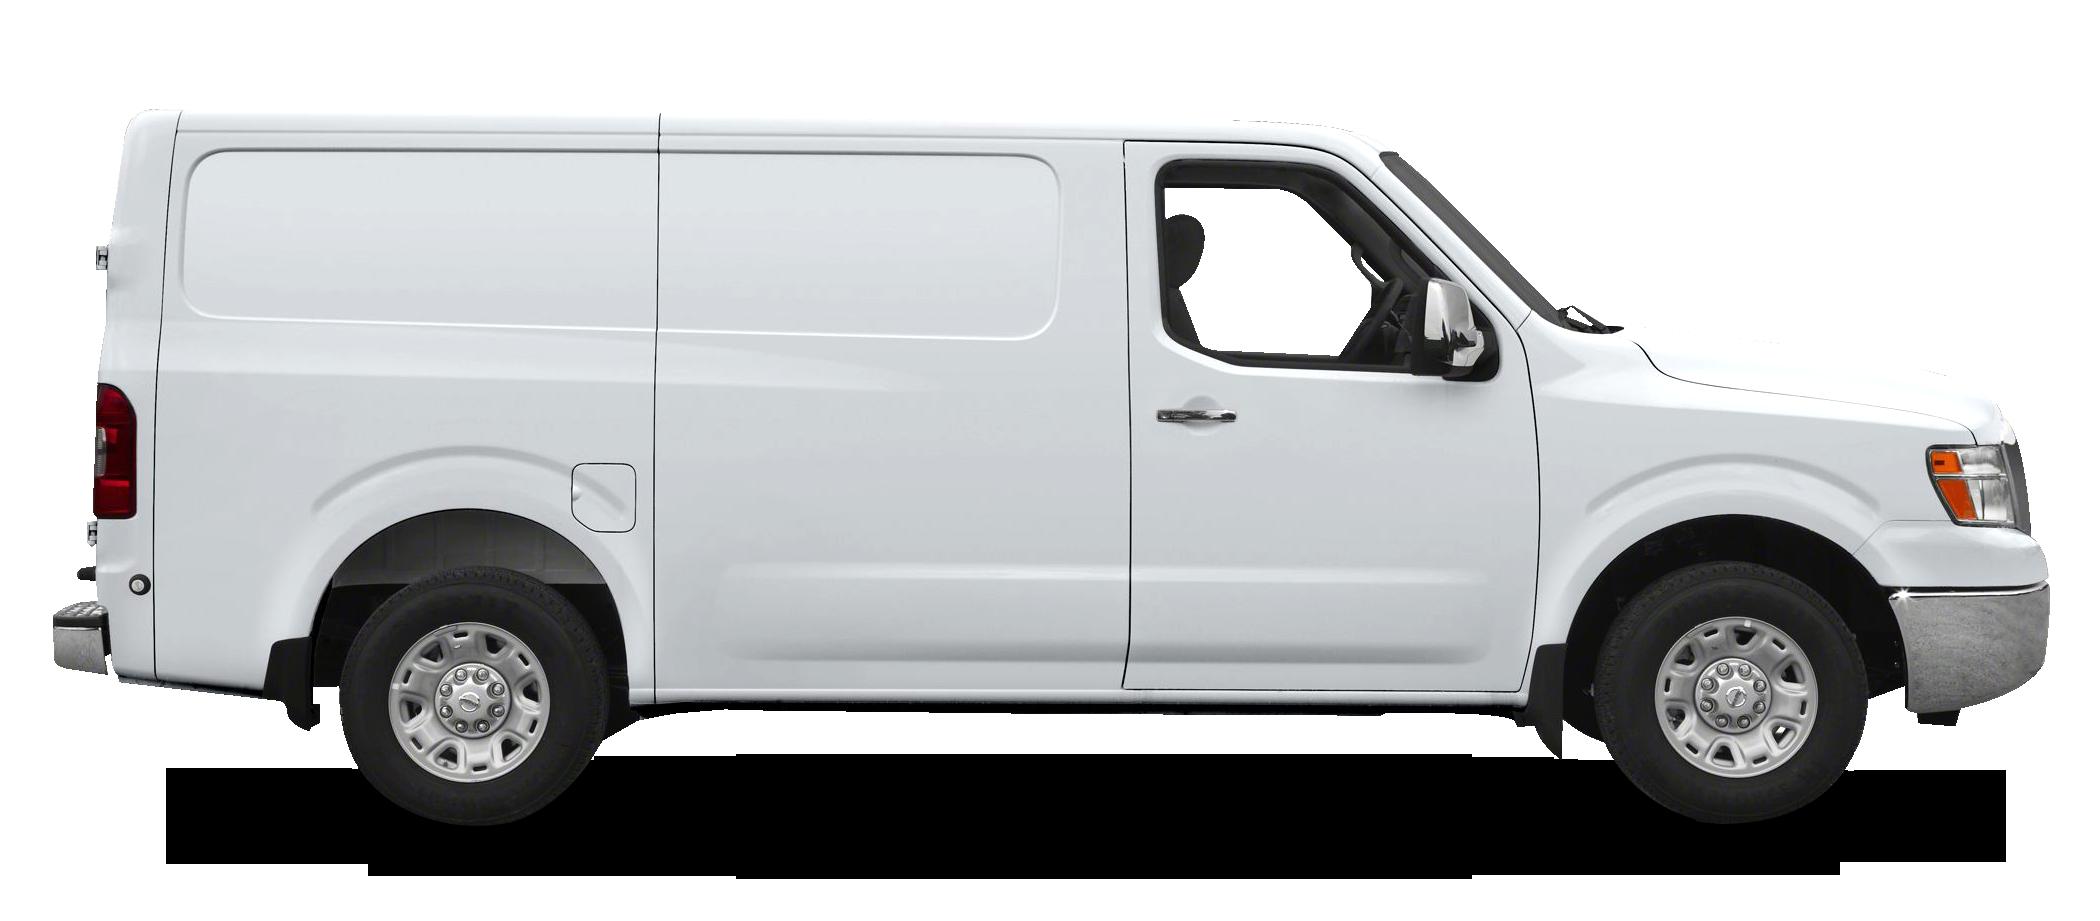 Delivery Van PNG Image